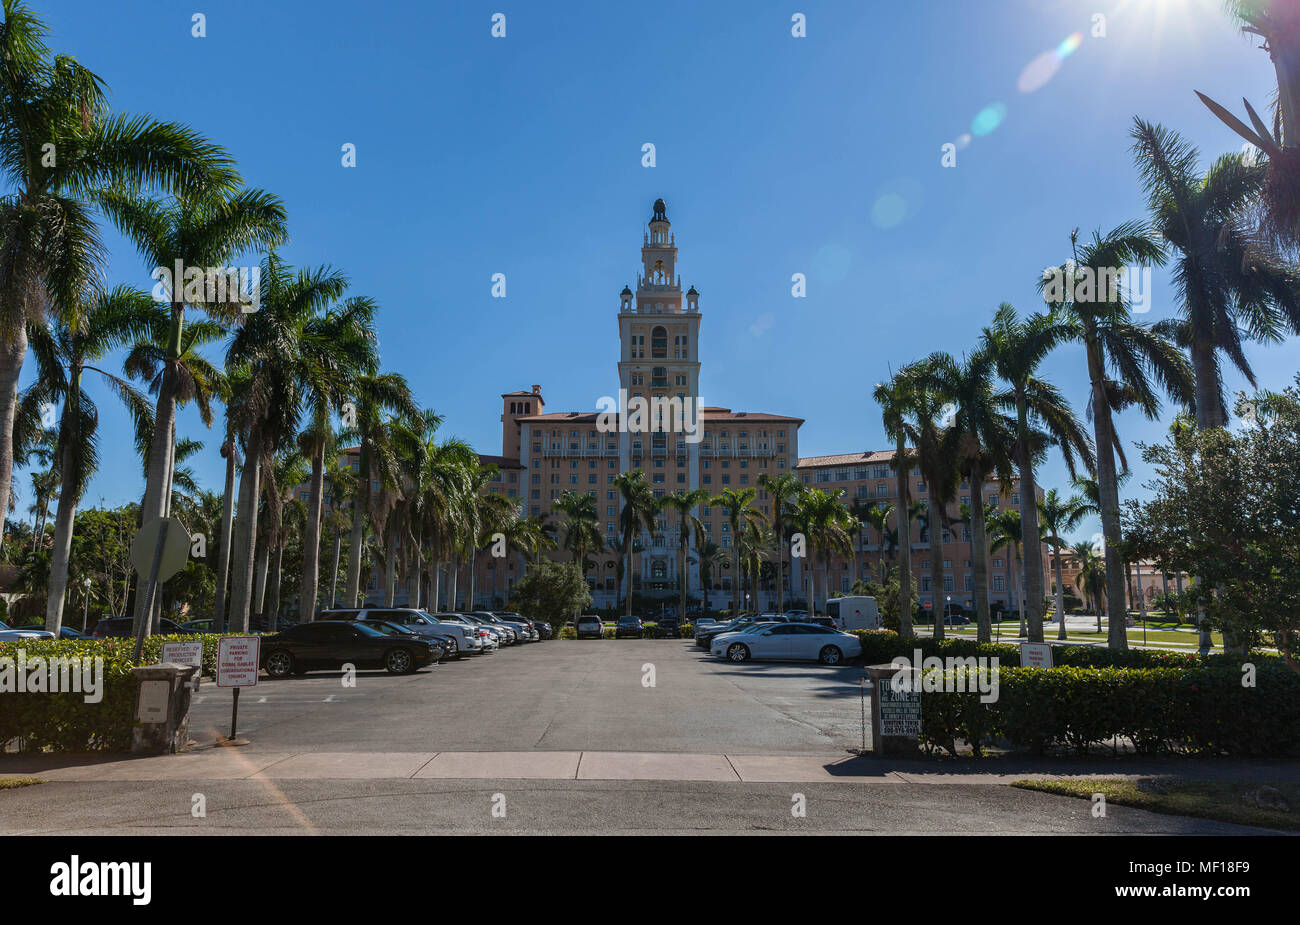 The Miami Biltmore Hotel seen from 1200 Malaga Avenue, Coral Gables, Miami-Dade, Florida, USA. - Stock Image